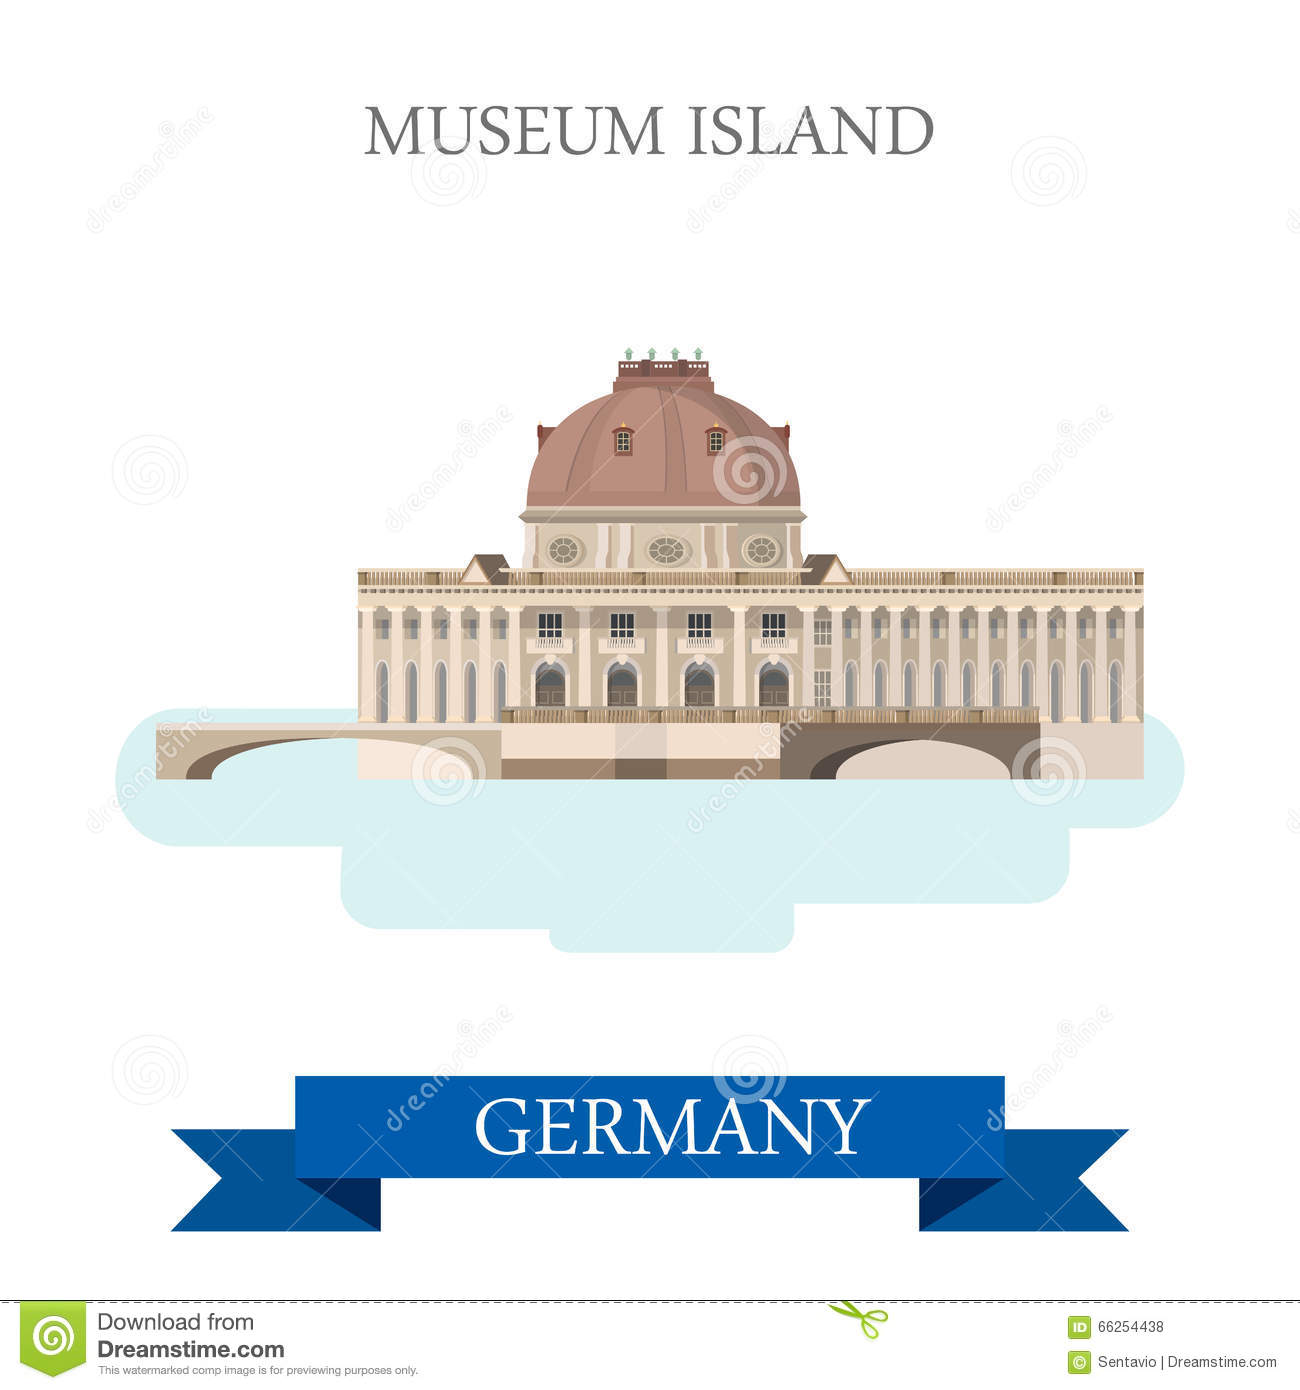 Museum Island Berlin Germany Flat Vector Attraction Landmark Stock.